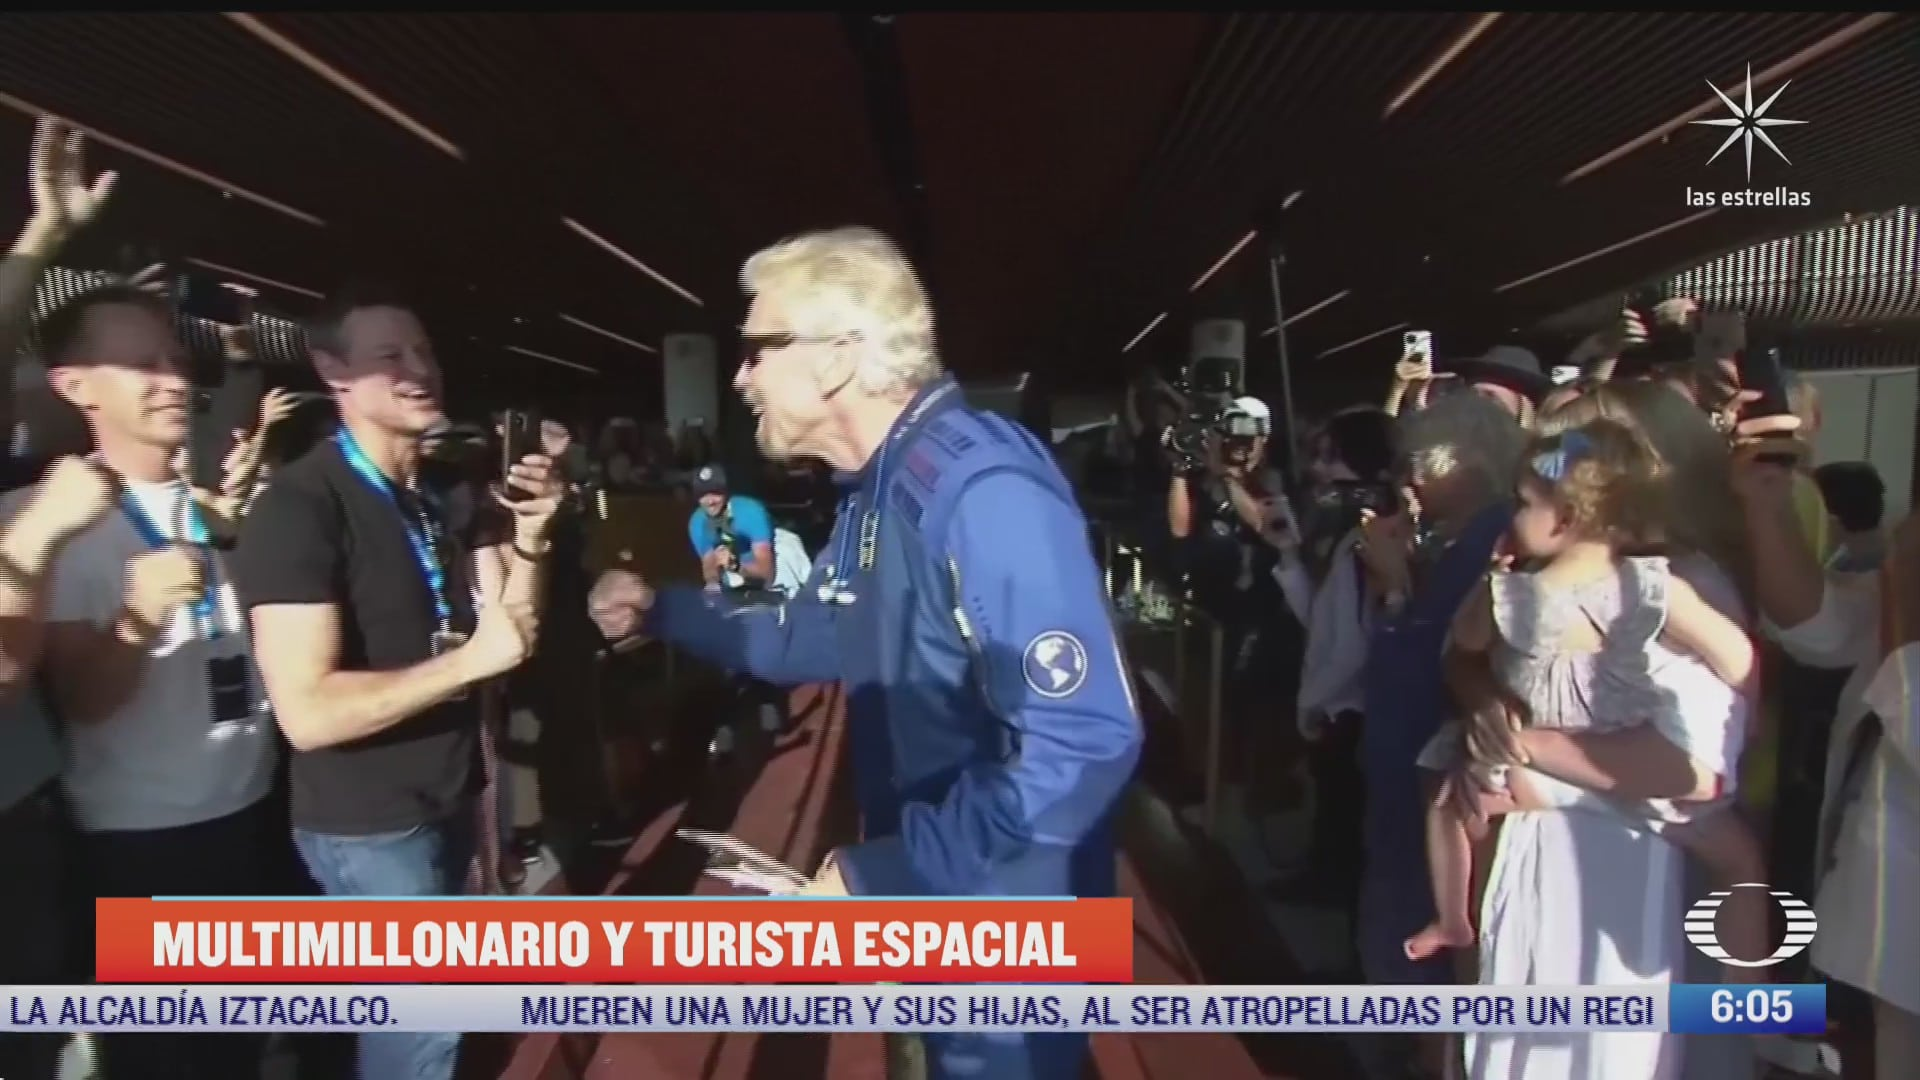 multimillonario richard branson realiza viaje al espacio